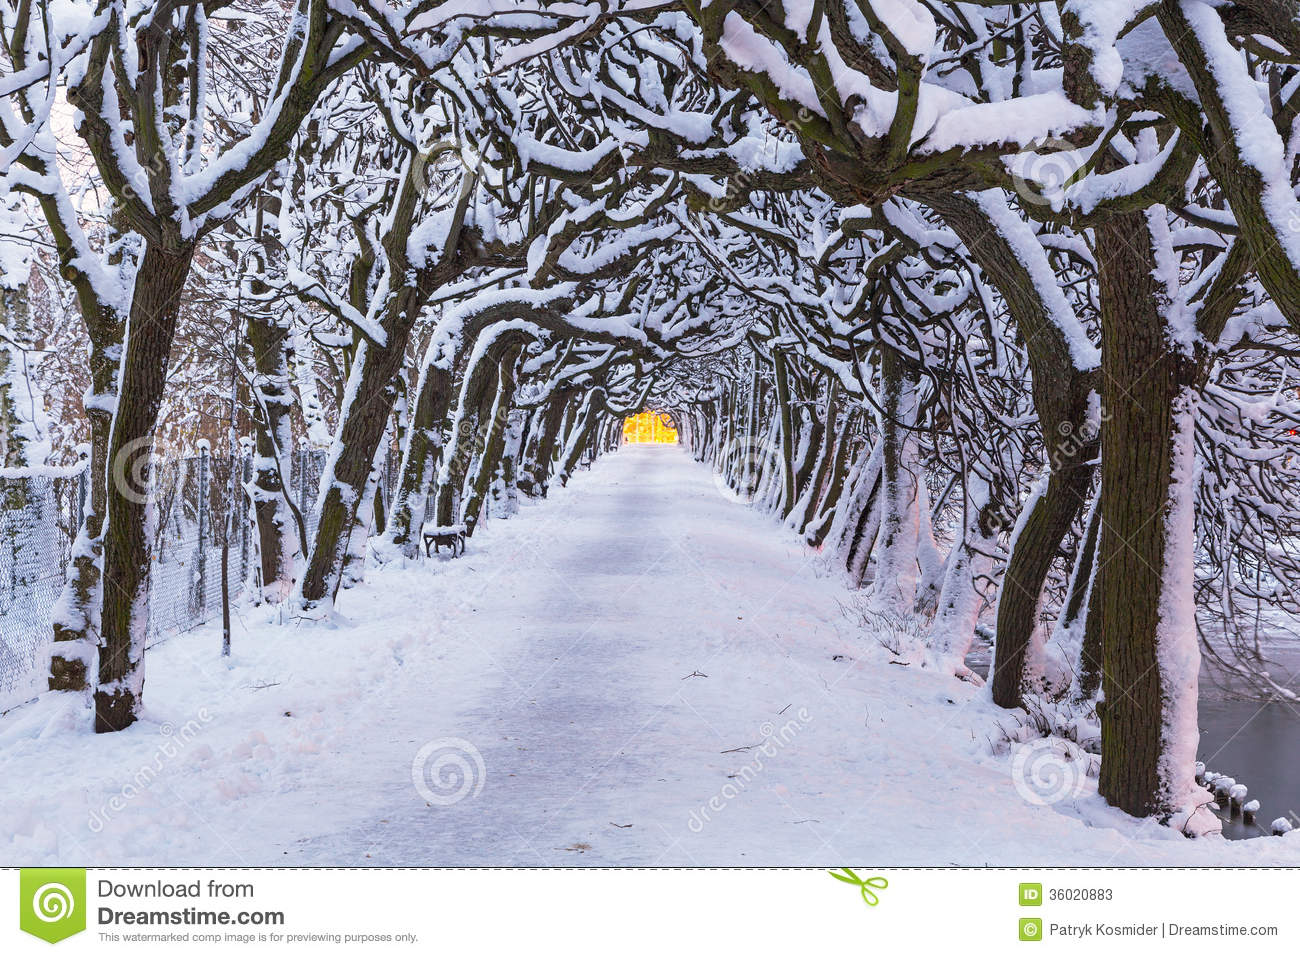 Winter Scenery Of Snowy Park In Gdansk Royalty Free Stock Photo.